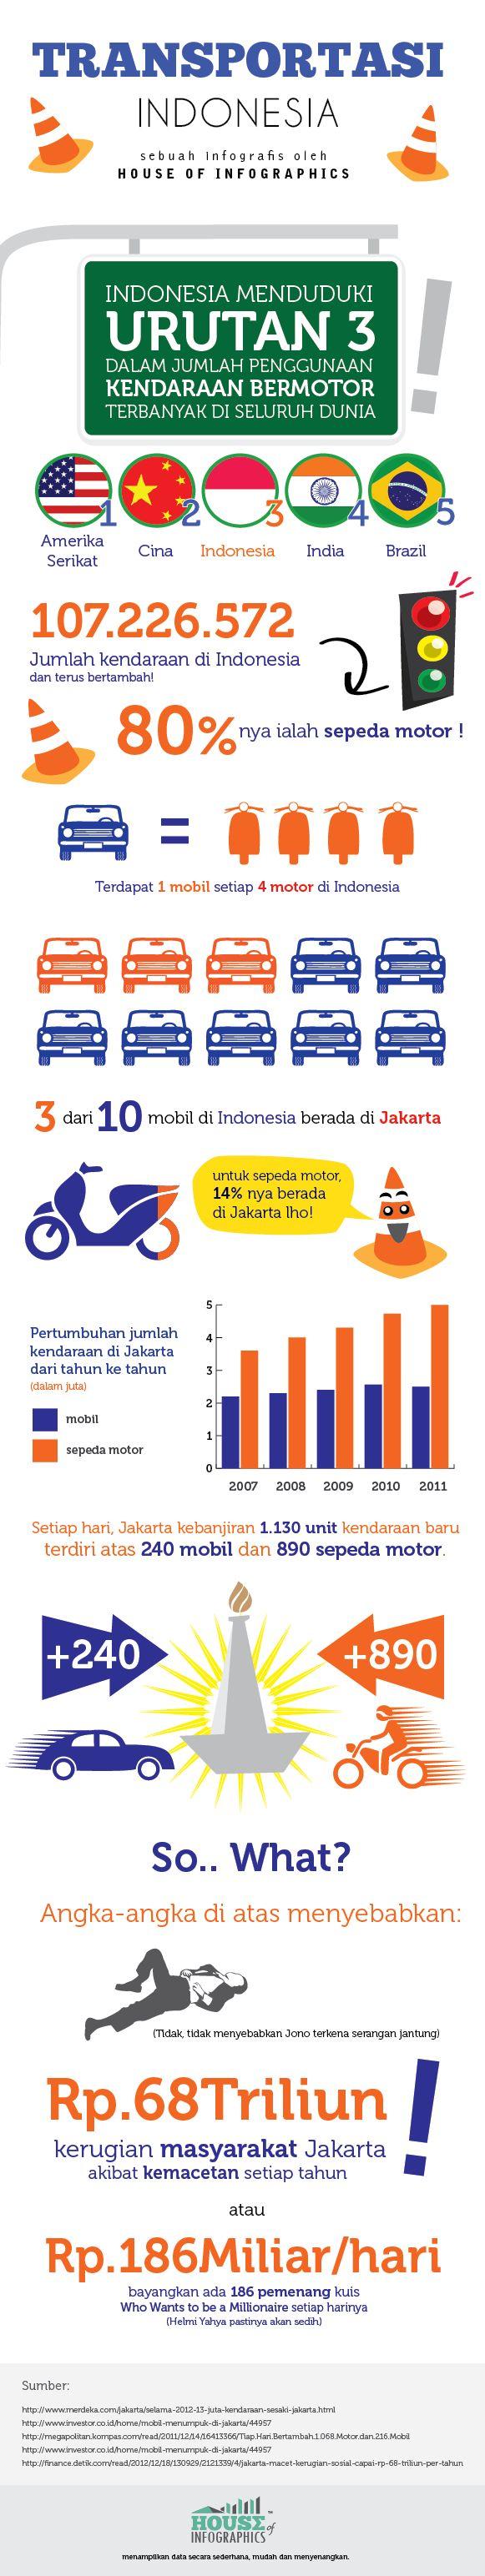 Infografis Transportasi Indonesia, khususnya Jakarta.